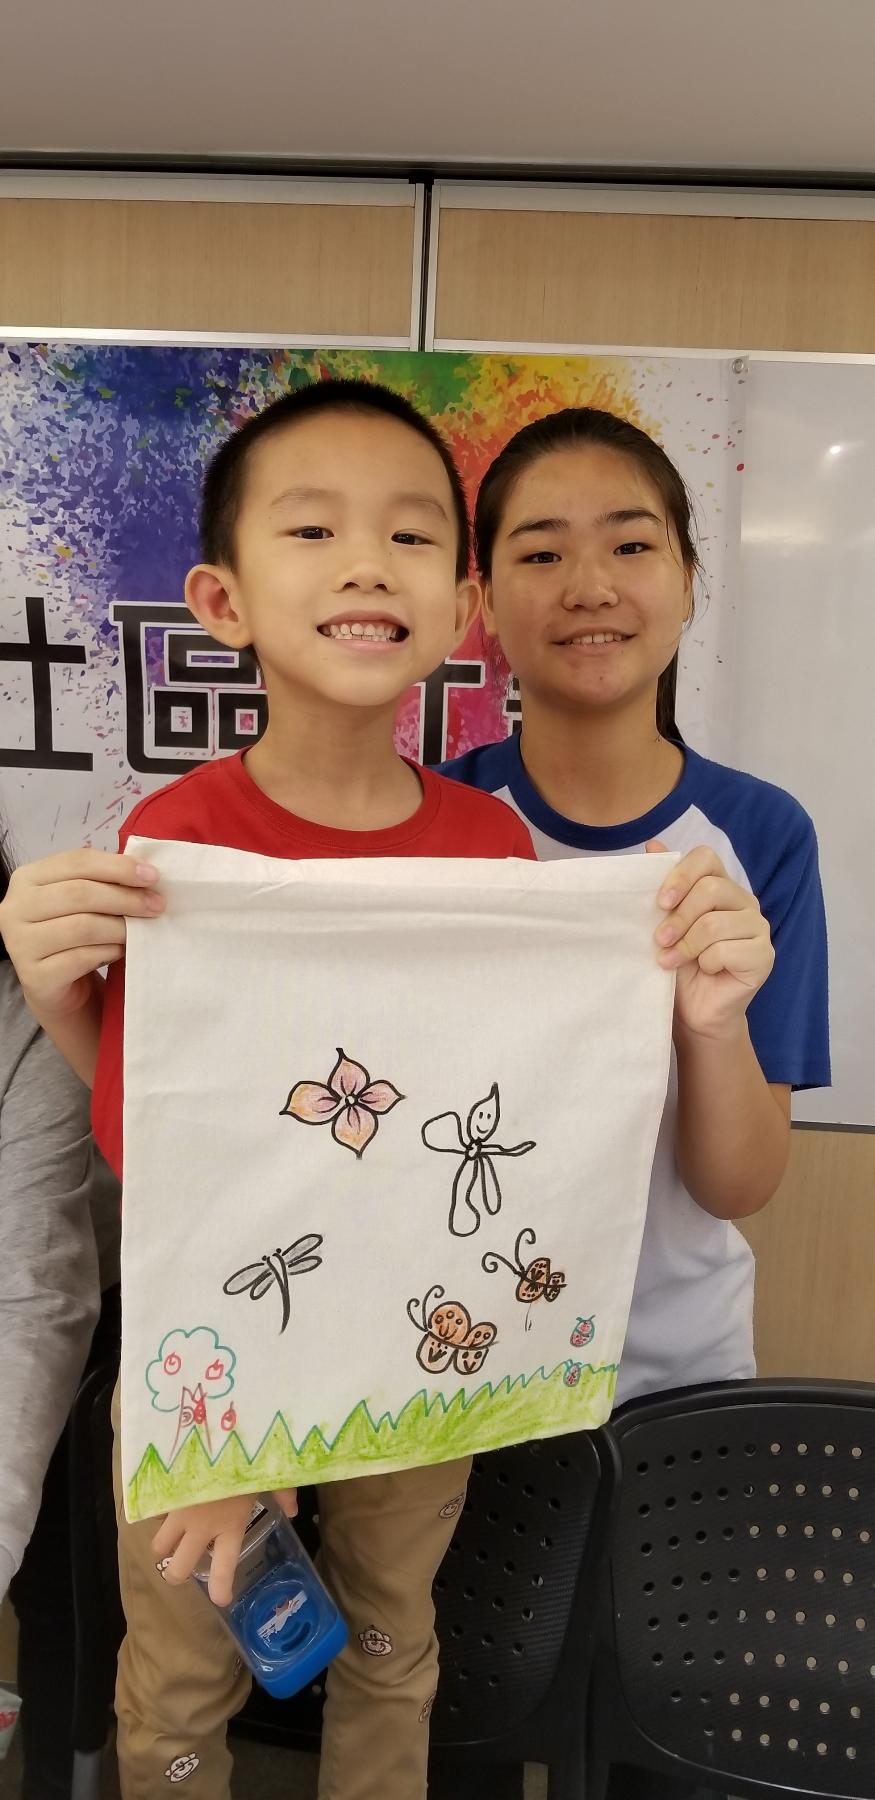 http://npc.edu.hk/sites/default/files/20181110_125138.jpg